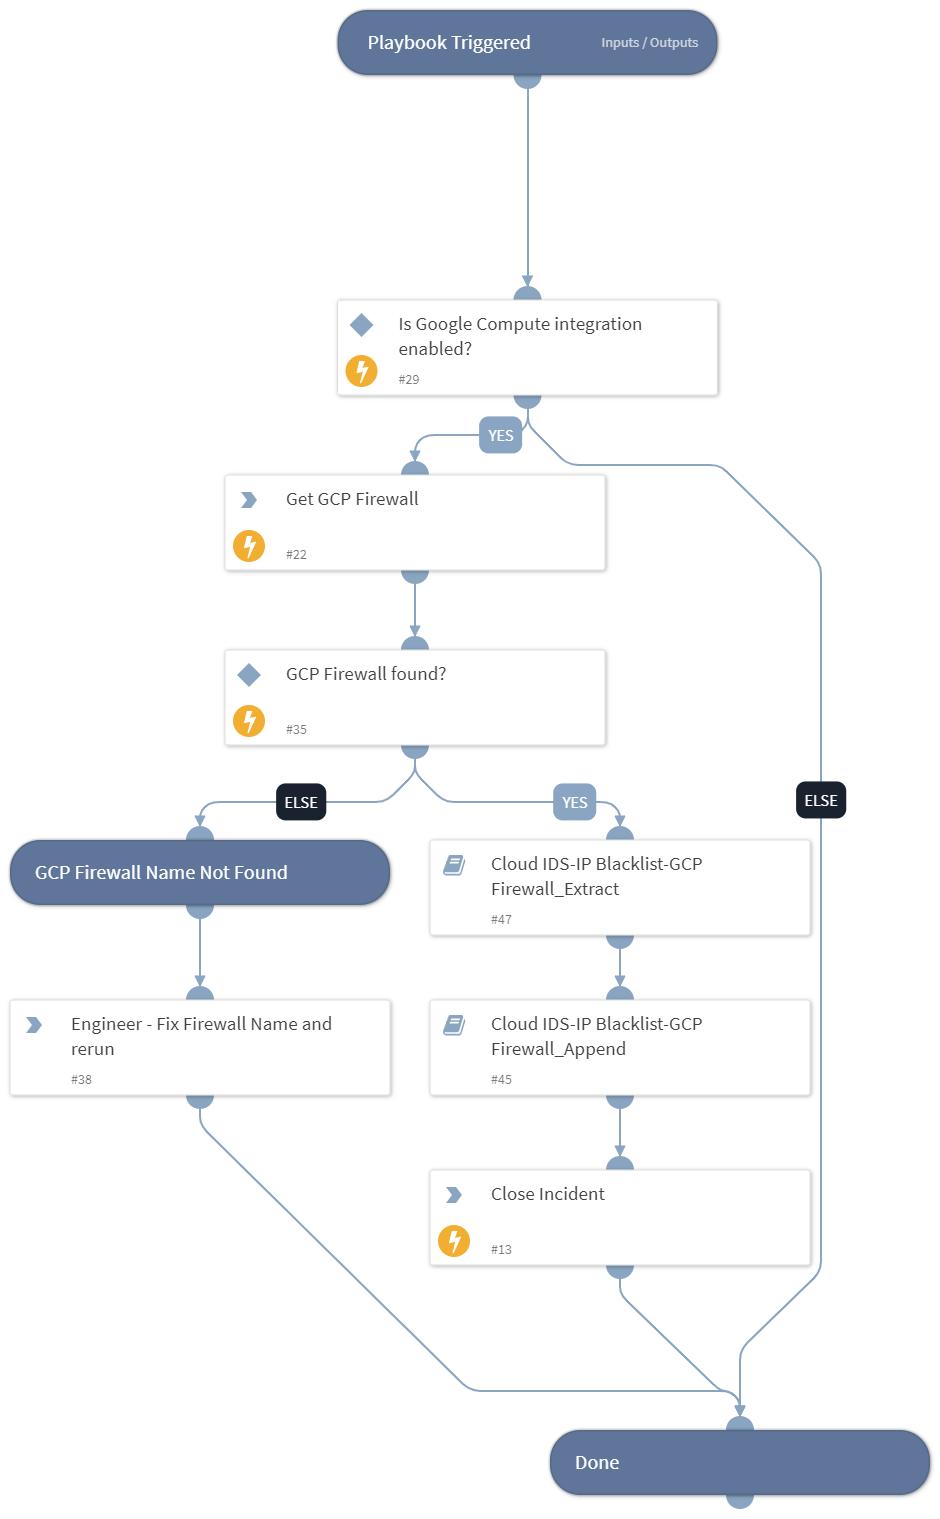 Cloud_IDS-IP_Blacklist-GCP_Firewall_Combine